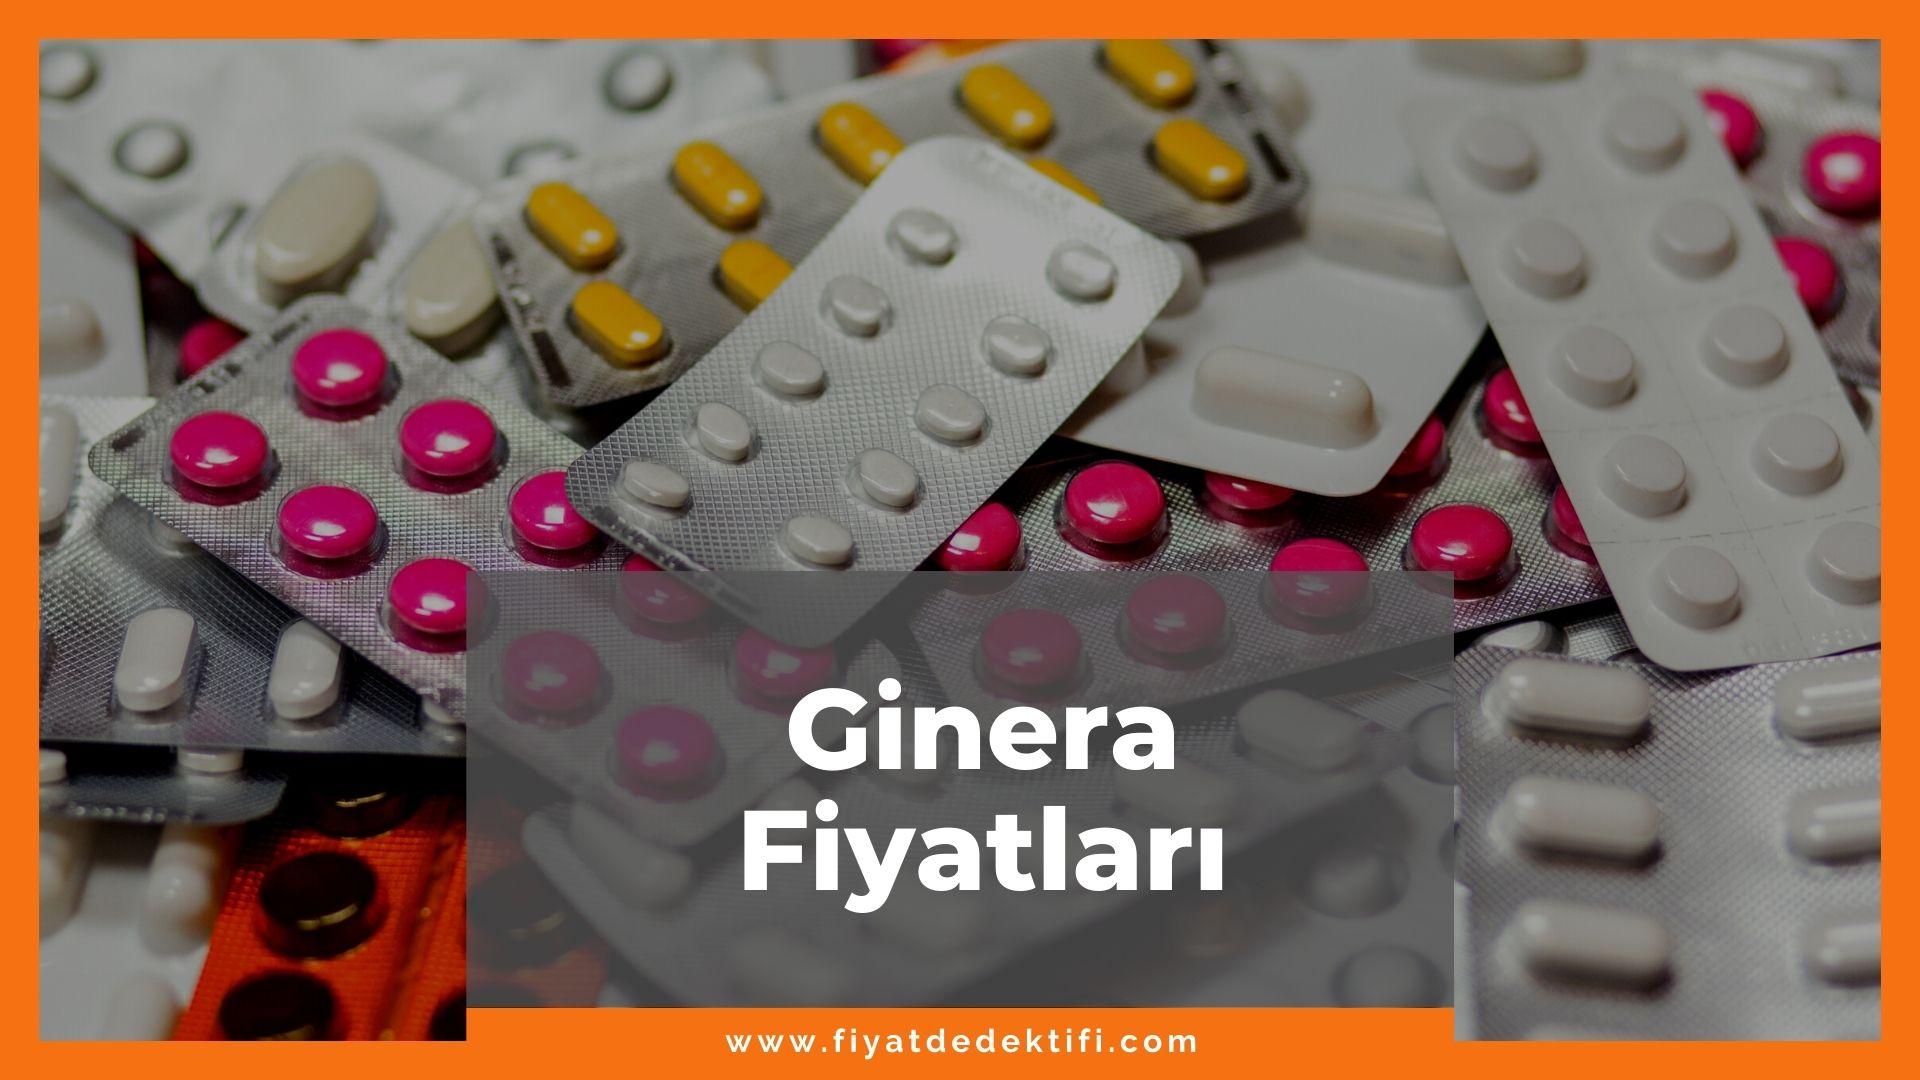 Ginera Fiyat 2021, Ginera Doğum Kontrol Hapı - Draje Fiyatı, ginera zamlandı mı, ginera zamlı fiyatı ne kadar kaç tl oldu